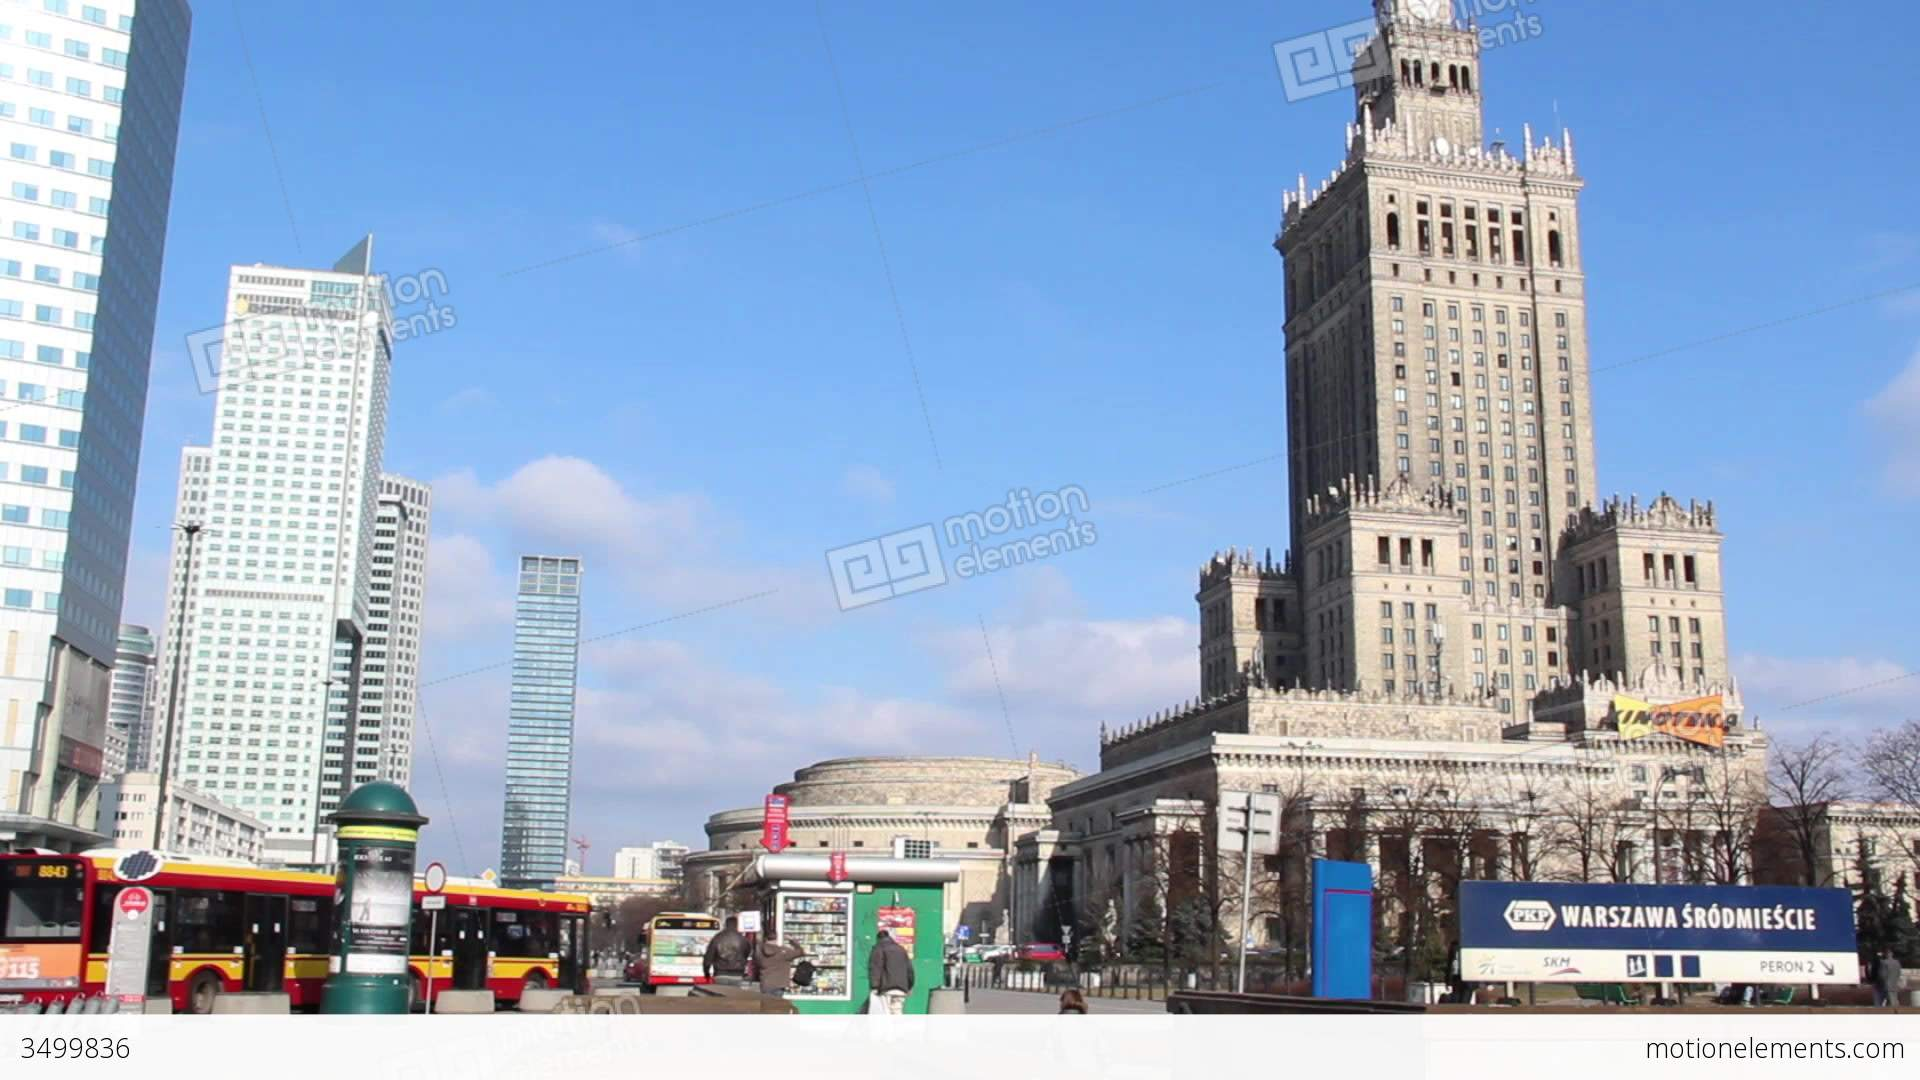 Warsaw city photo